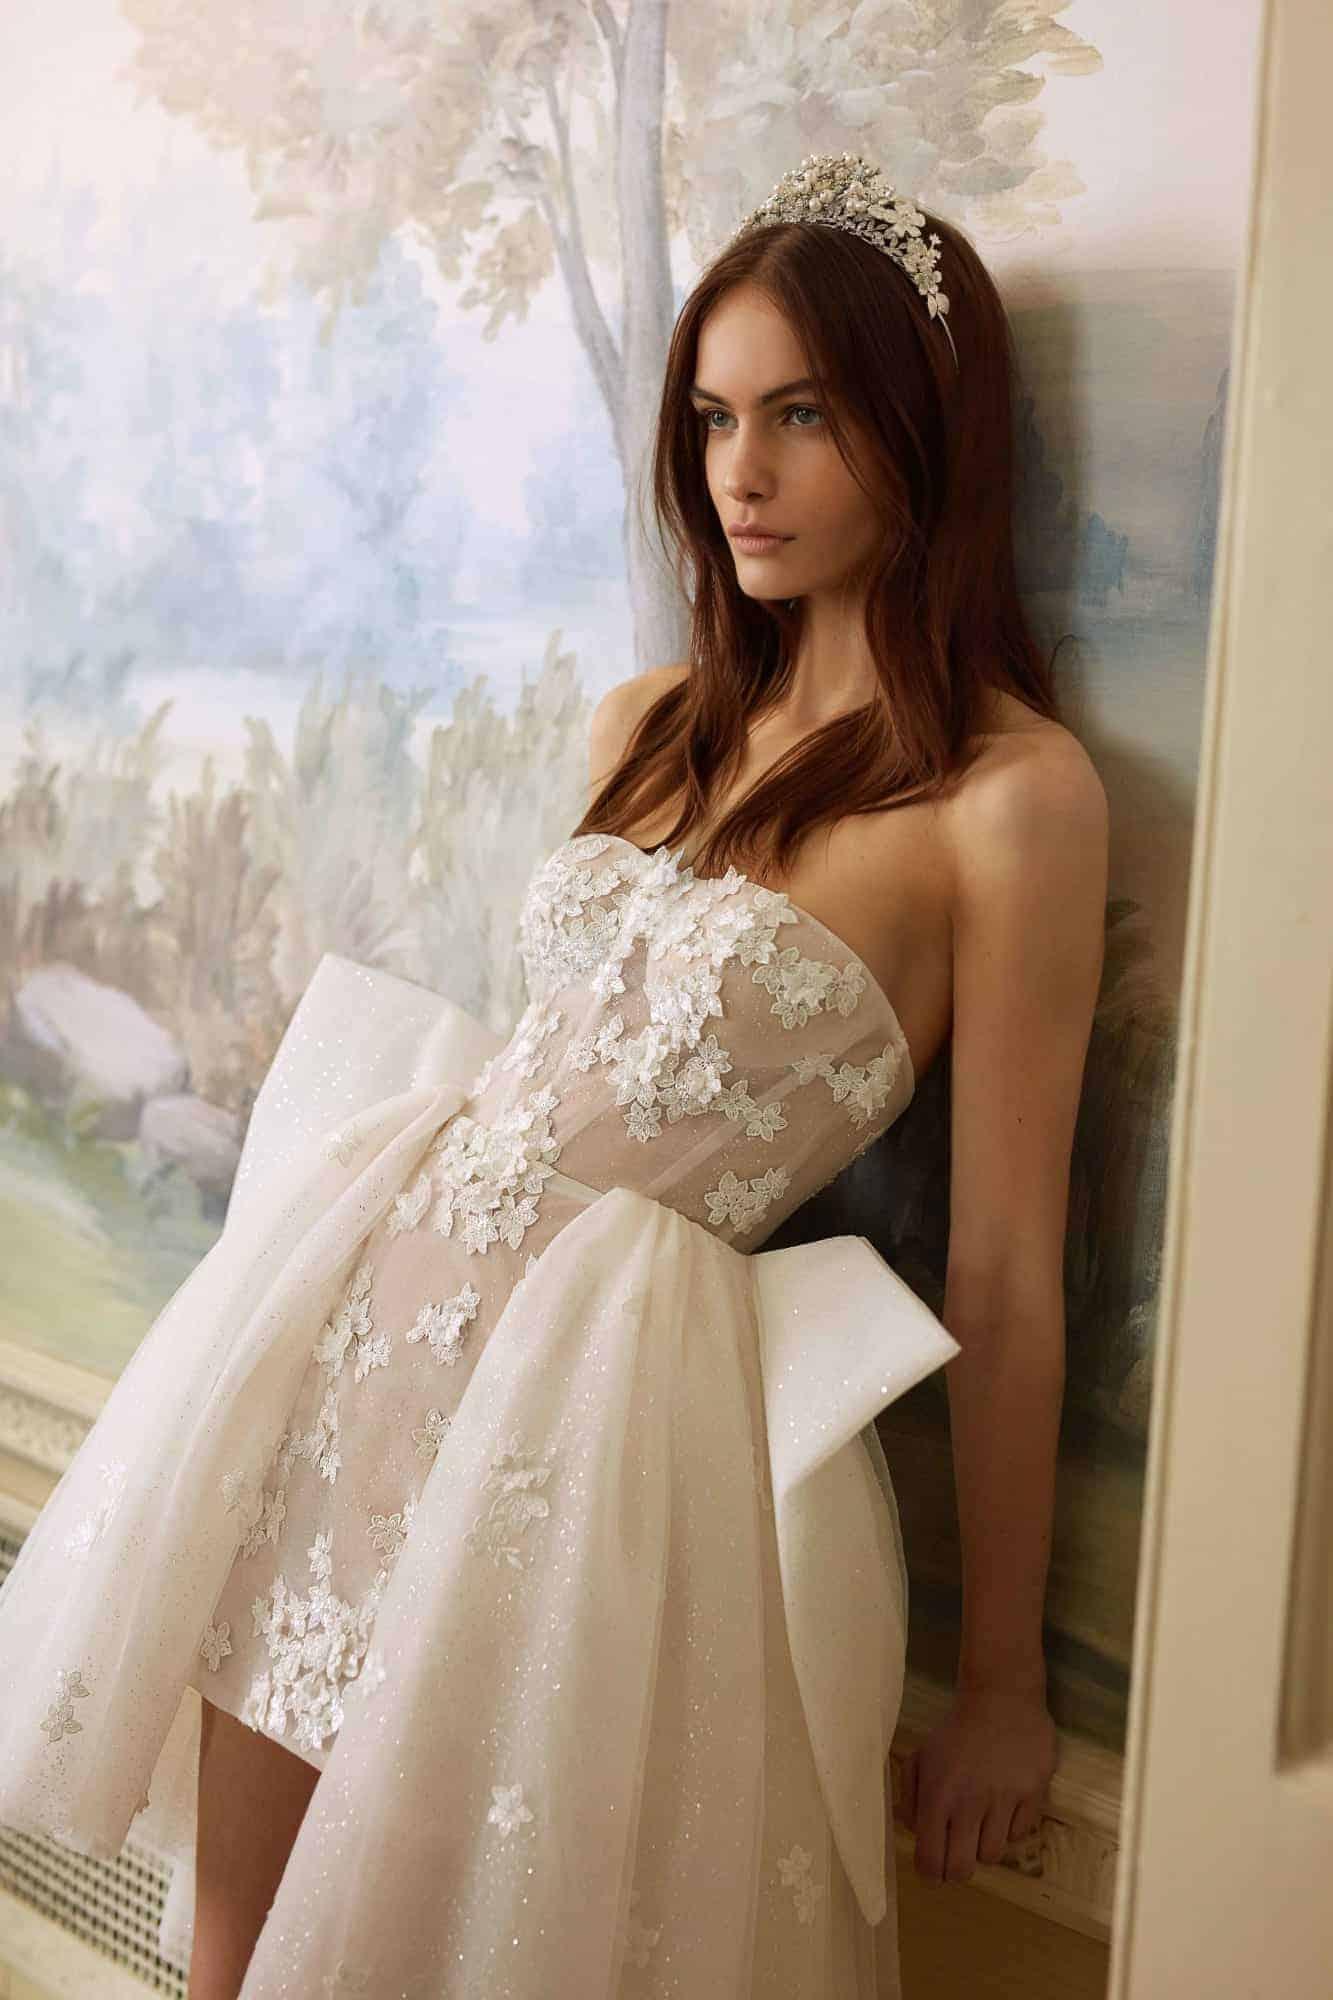 short strapless wedding dress by Galia Lahav